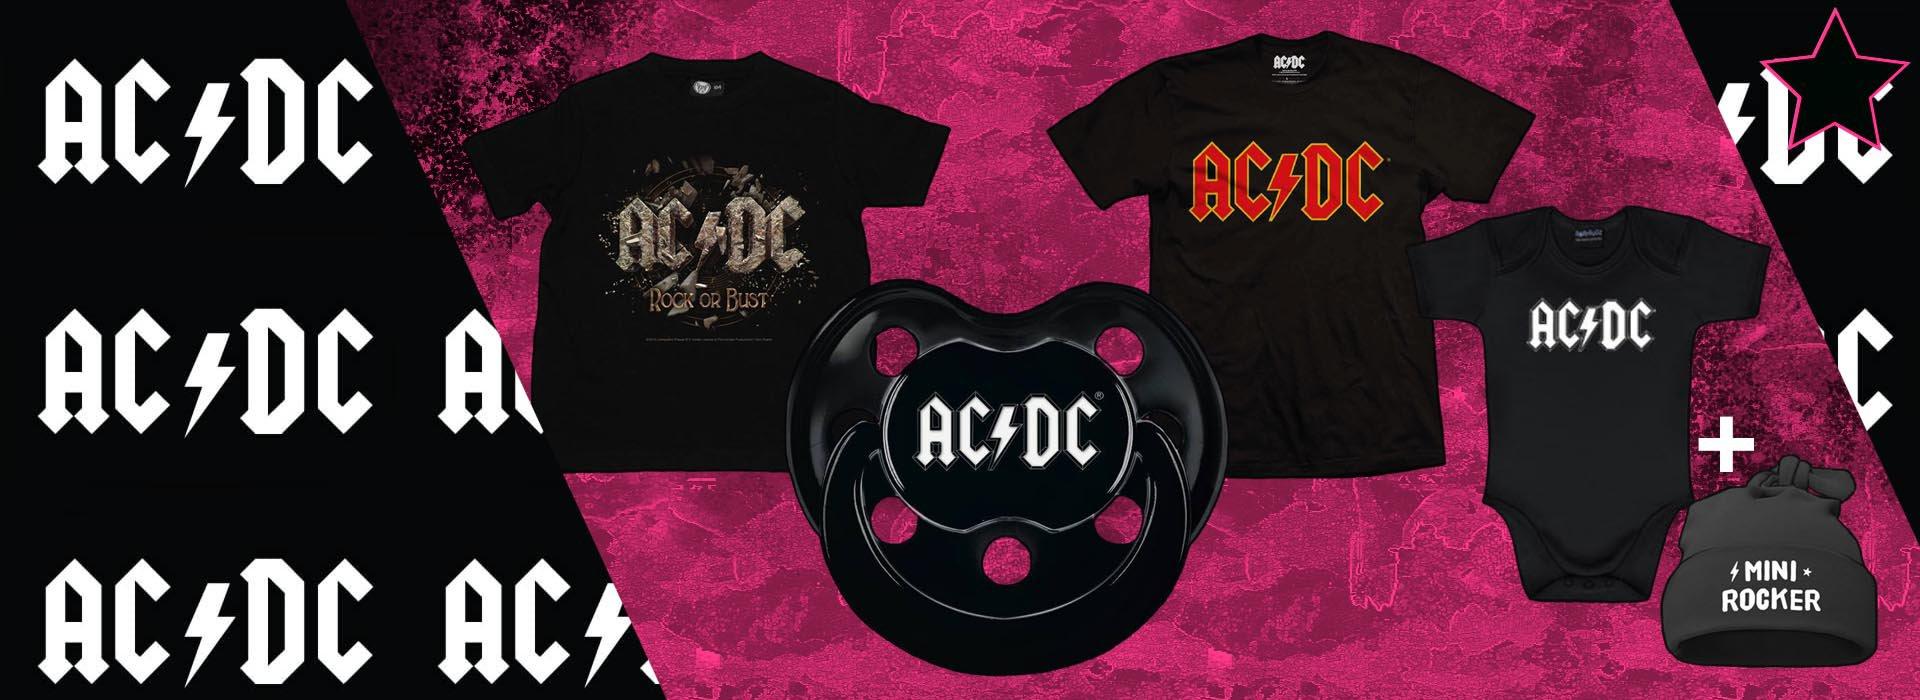 baby rock & metal kleidung, rocker klamotten, rocker shop